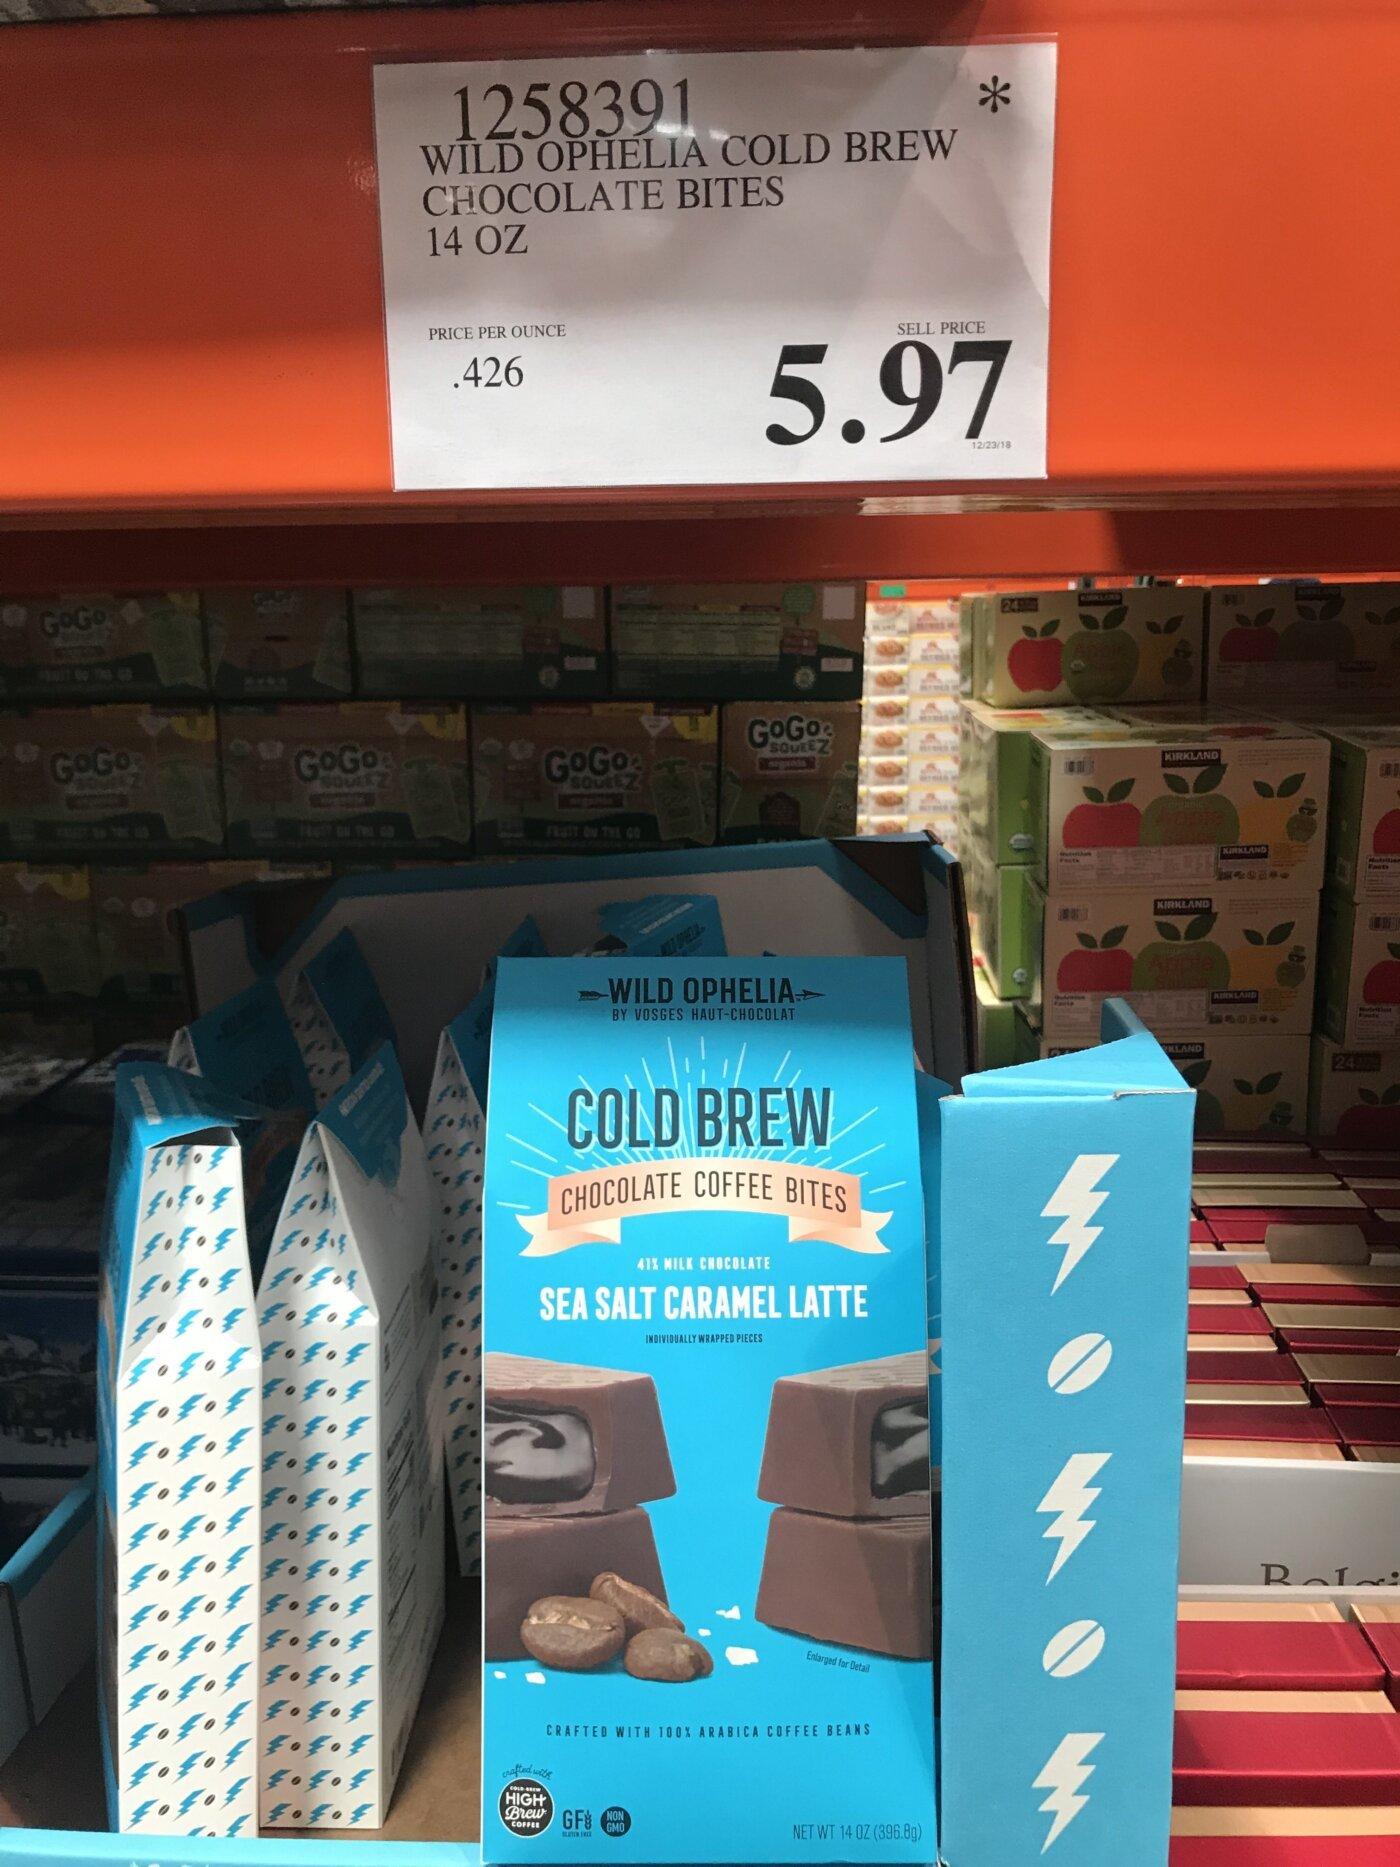 Wild Ophelia Cold Brew Chocolate Bites